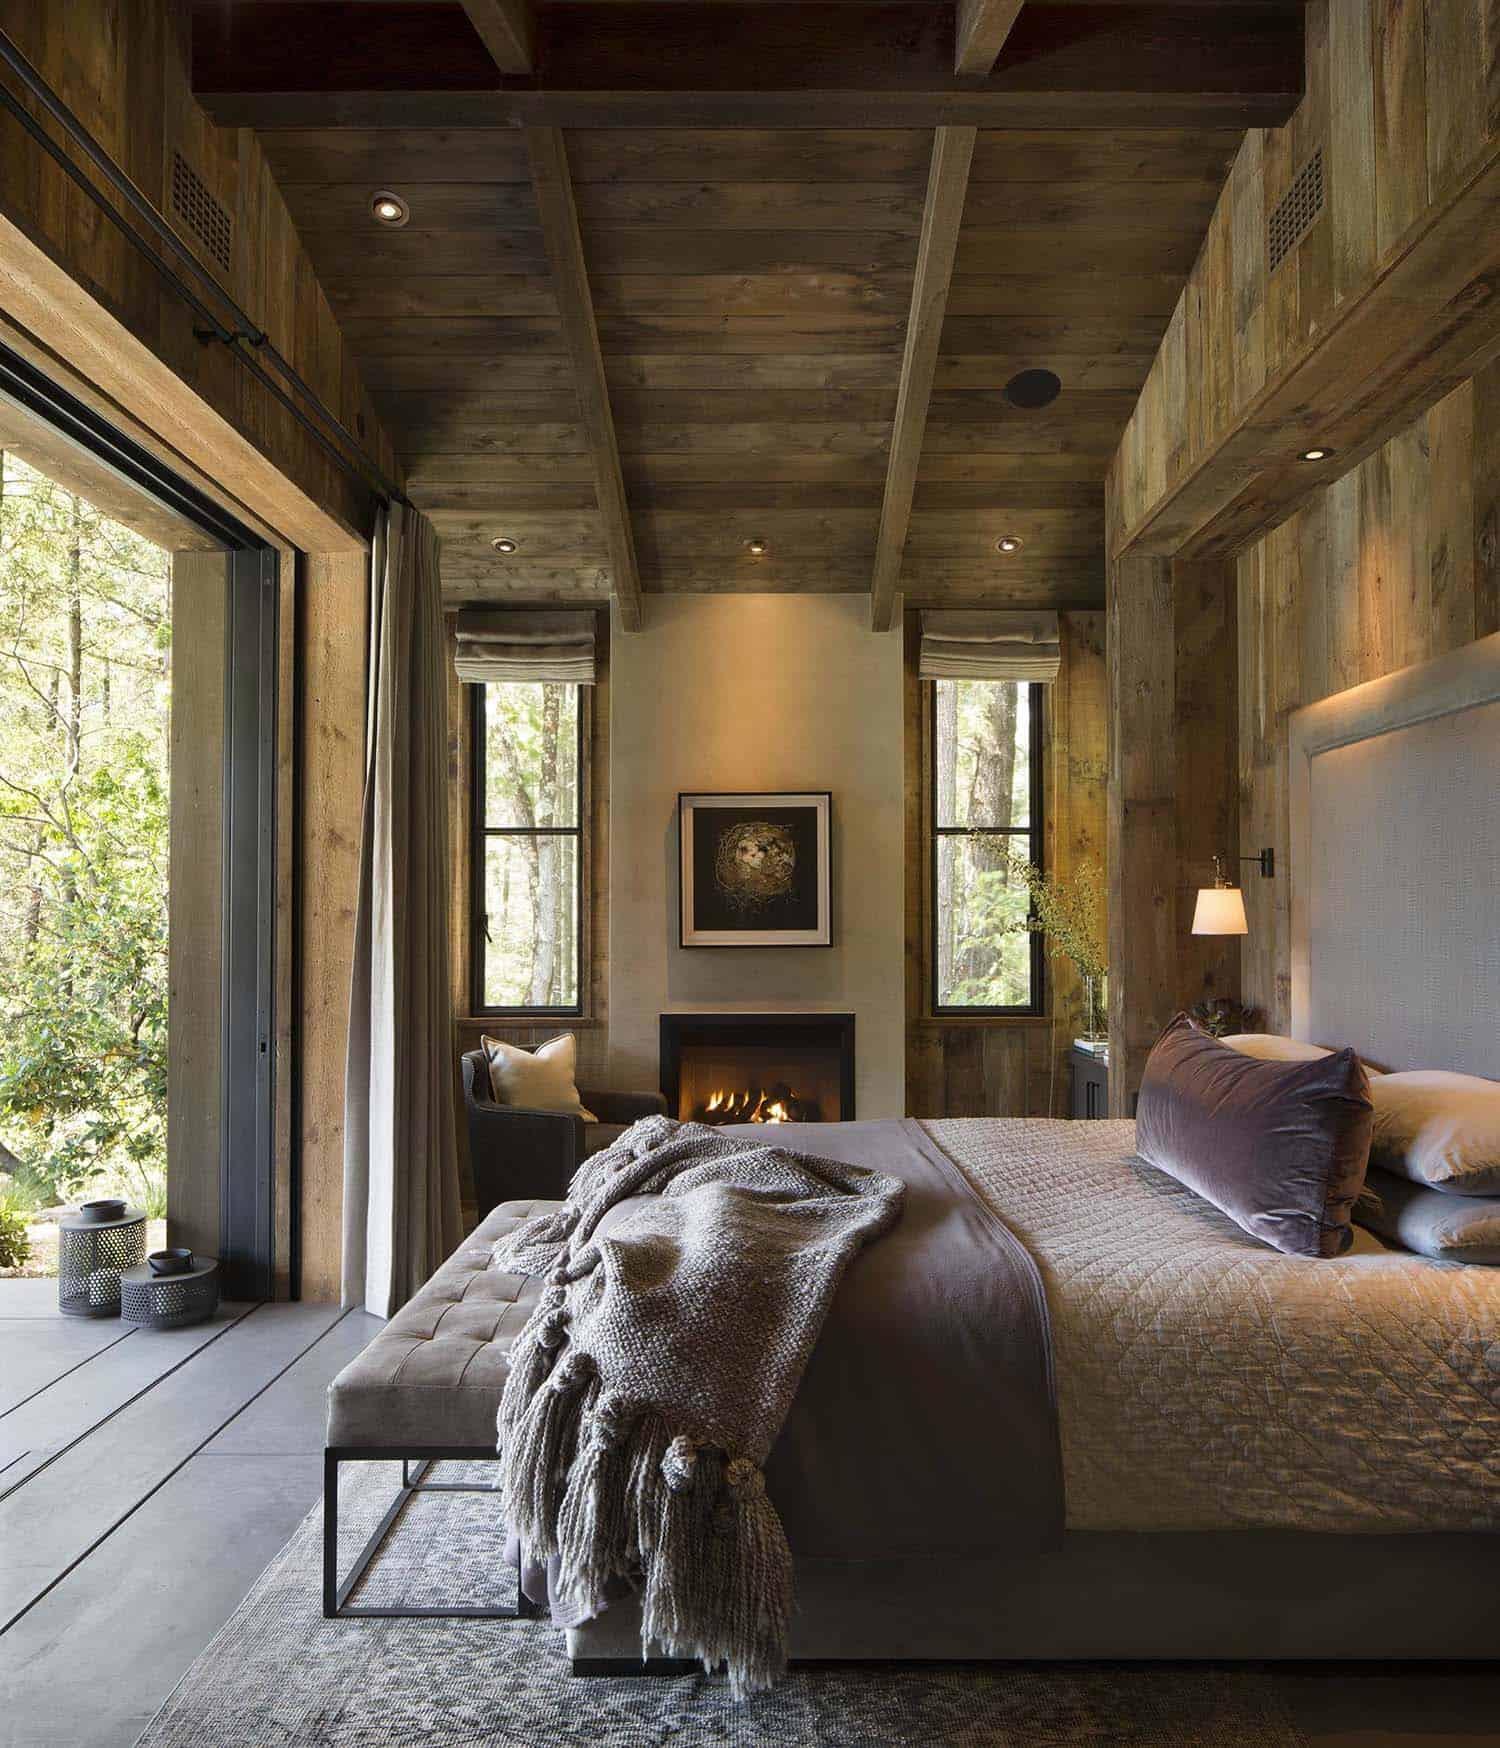 Maison de style ferme-Jennifer Robin Interiors-009-1 Kindesign